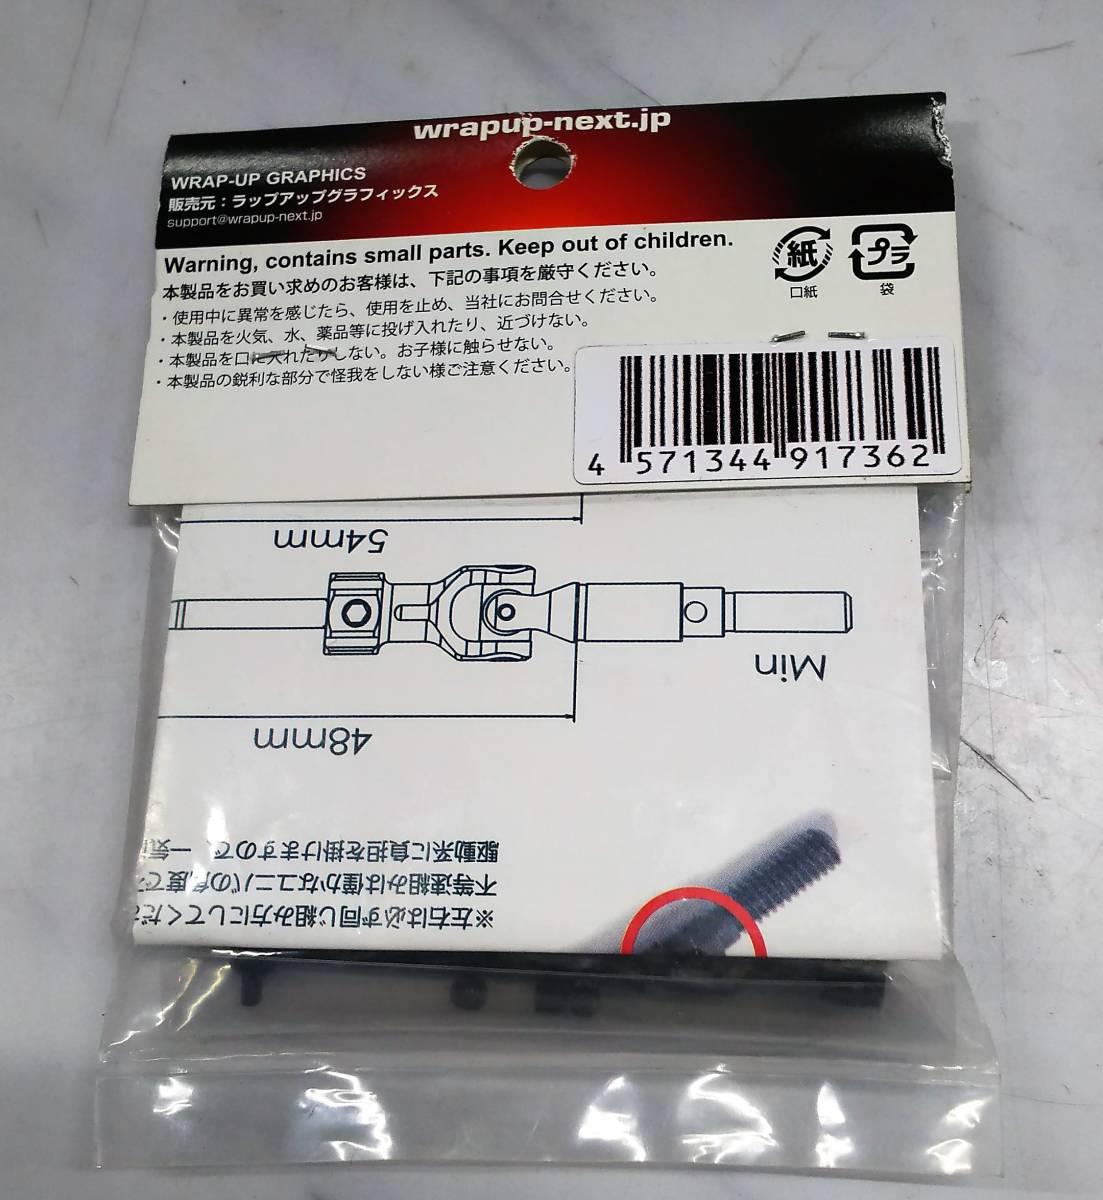 WRAP-UP NEXT 0288-FD ハイトラクションリヤユニバーサルシャフト(6mm アクスル/ 長さ調整機構) ドリパケ/VXサス系